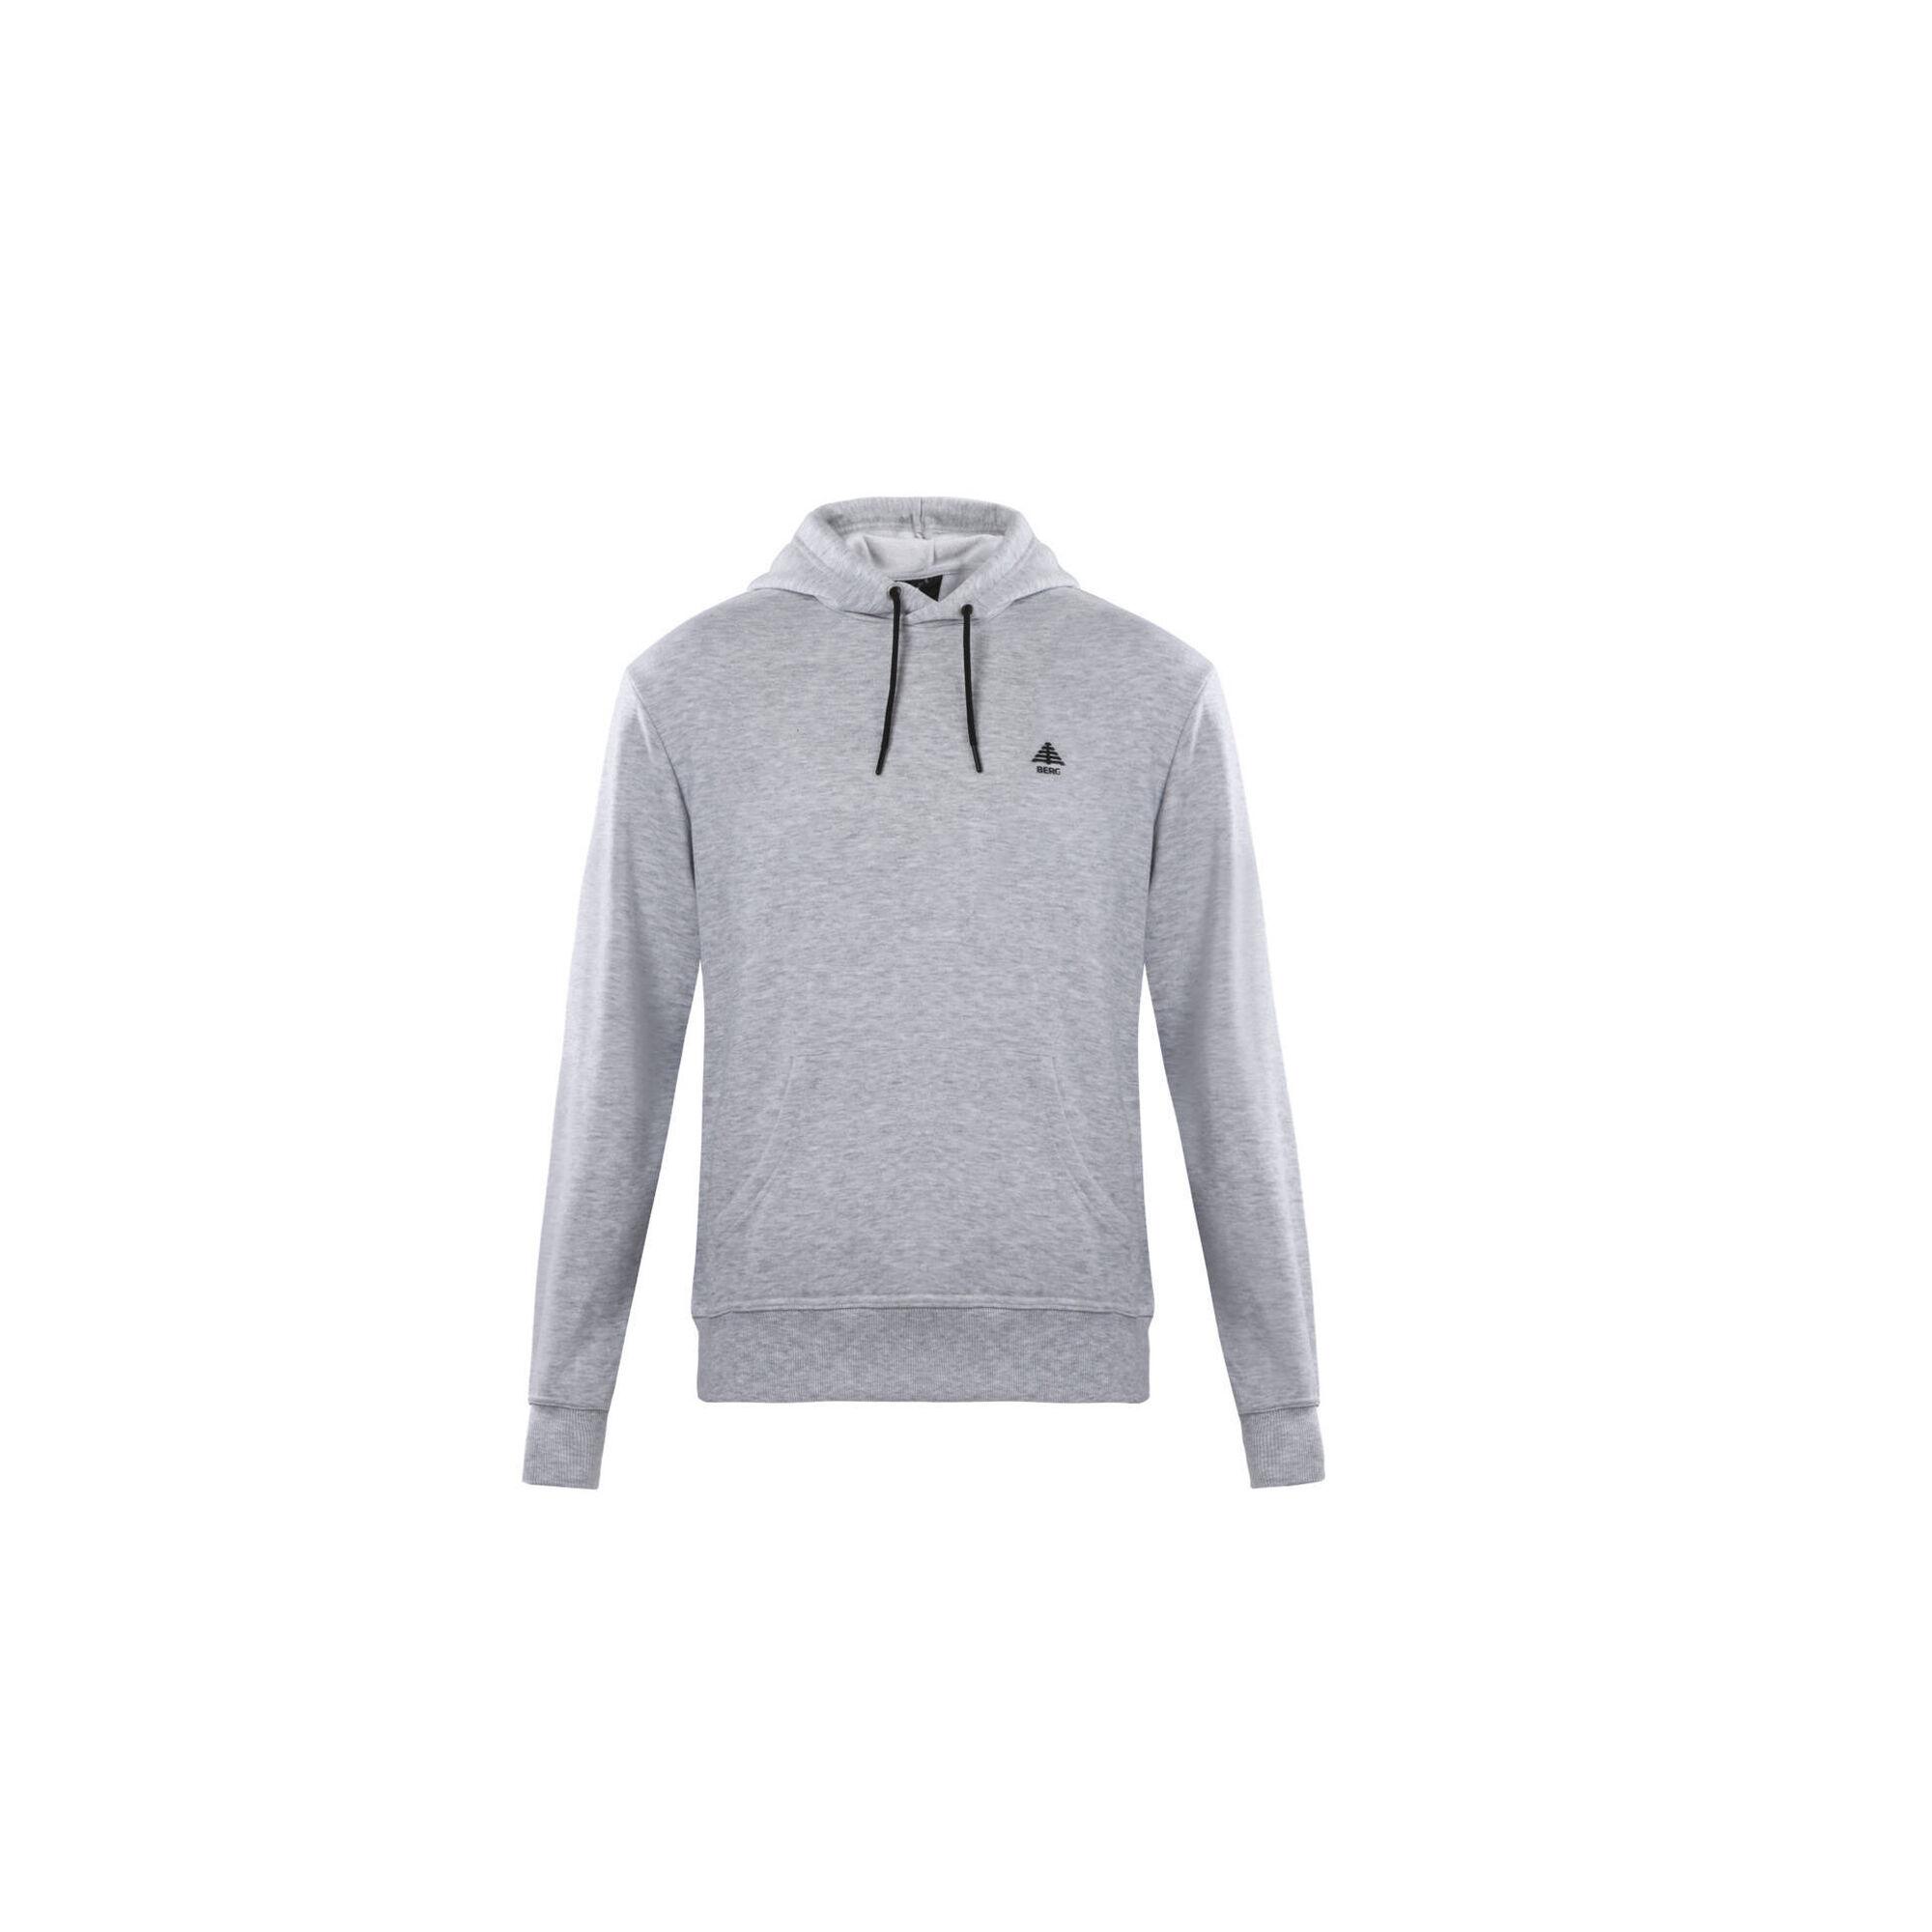 Sweatshirt Homem Cinza